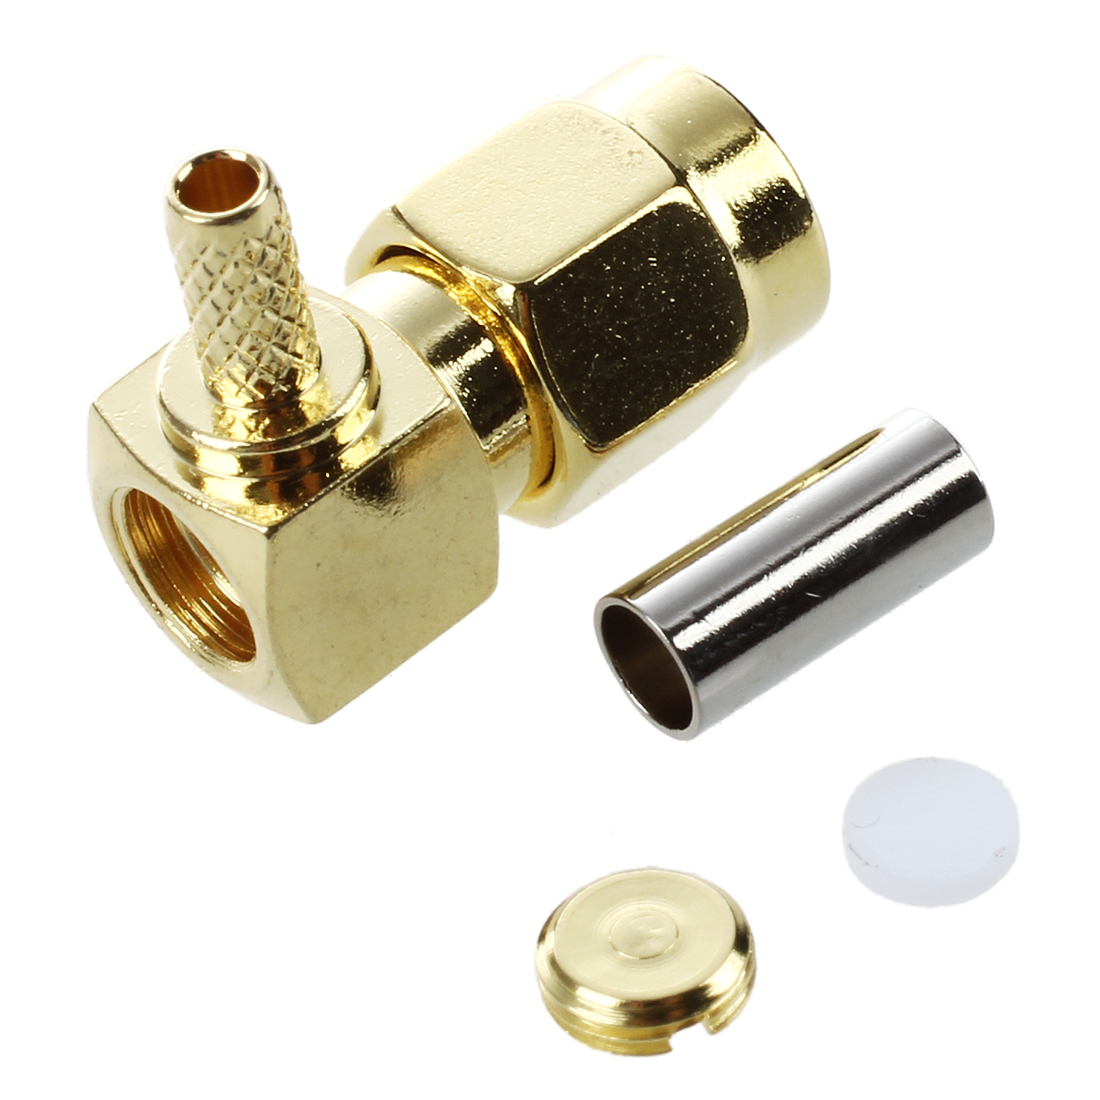 5x SMA Male Plug Right Angle RG174 RG316 LMR100 RF Coax Connector